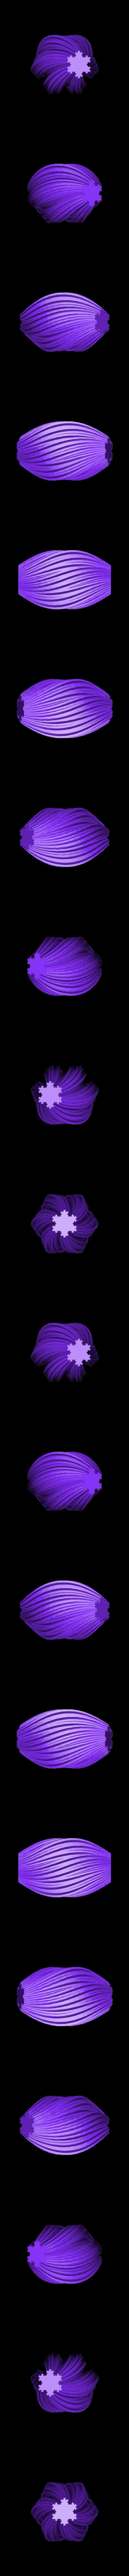 Koch3Vase01_repaired.stl Download free STL file Large Twisted Koch Snowflake Vase • 3D print design, Darkolas